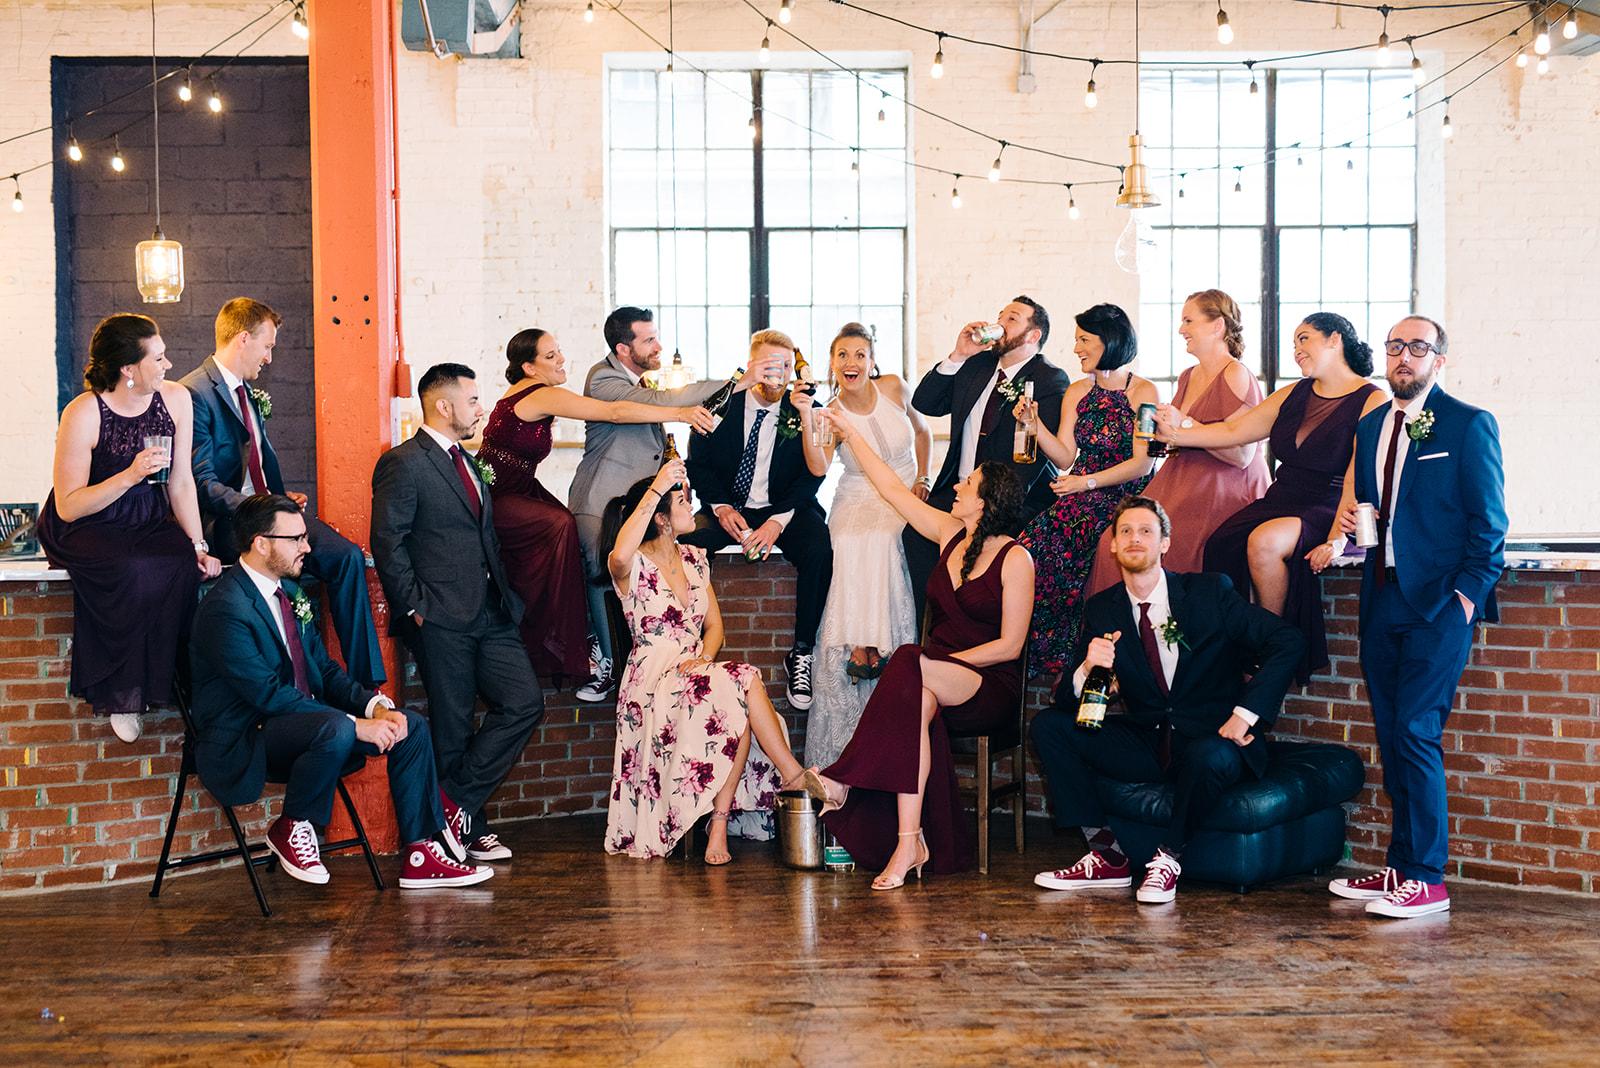 Art Factory Wedding- Audrey+Ryan-Bridal Party Photos-Paterson New York- Olivia Christina Photo (63)_websize.jpg